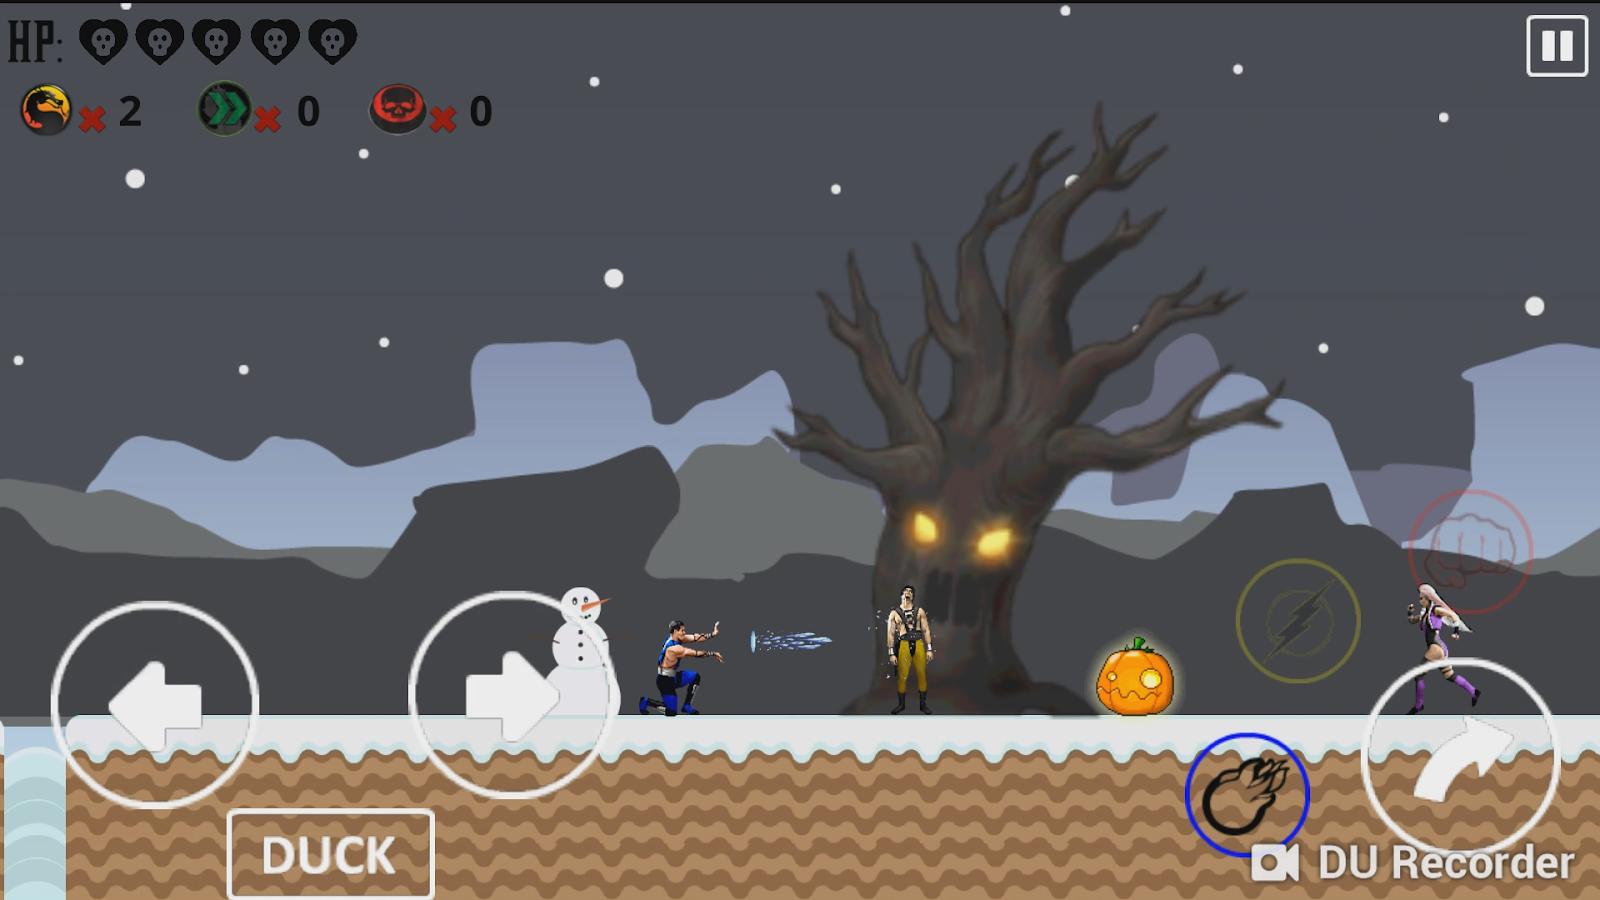 Mortal Kombat Reimagined 1 5 APK Download - Android